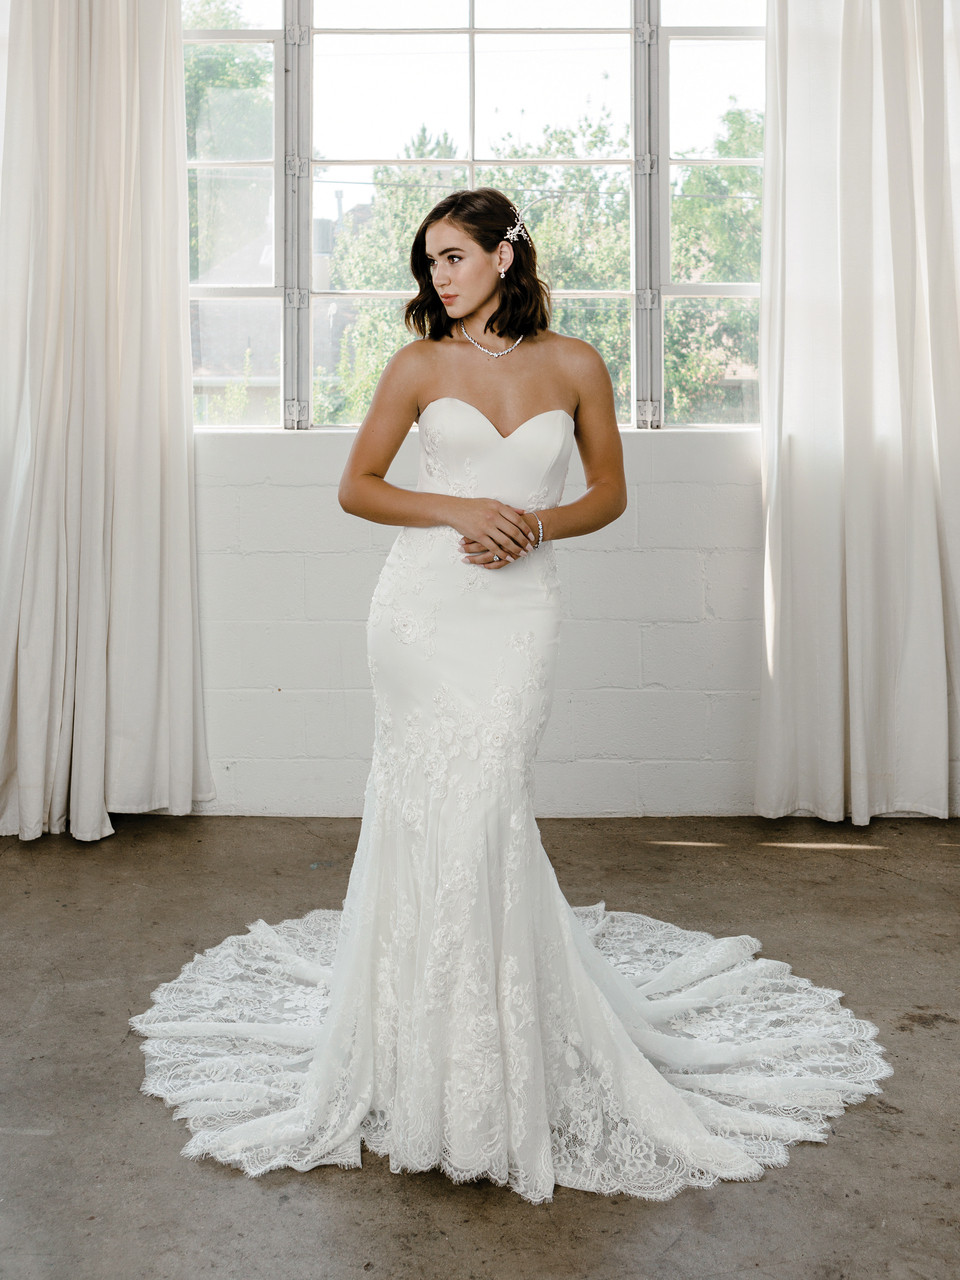 En Vogue Bridal Bracelet Set - Style BL2171